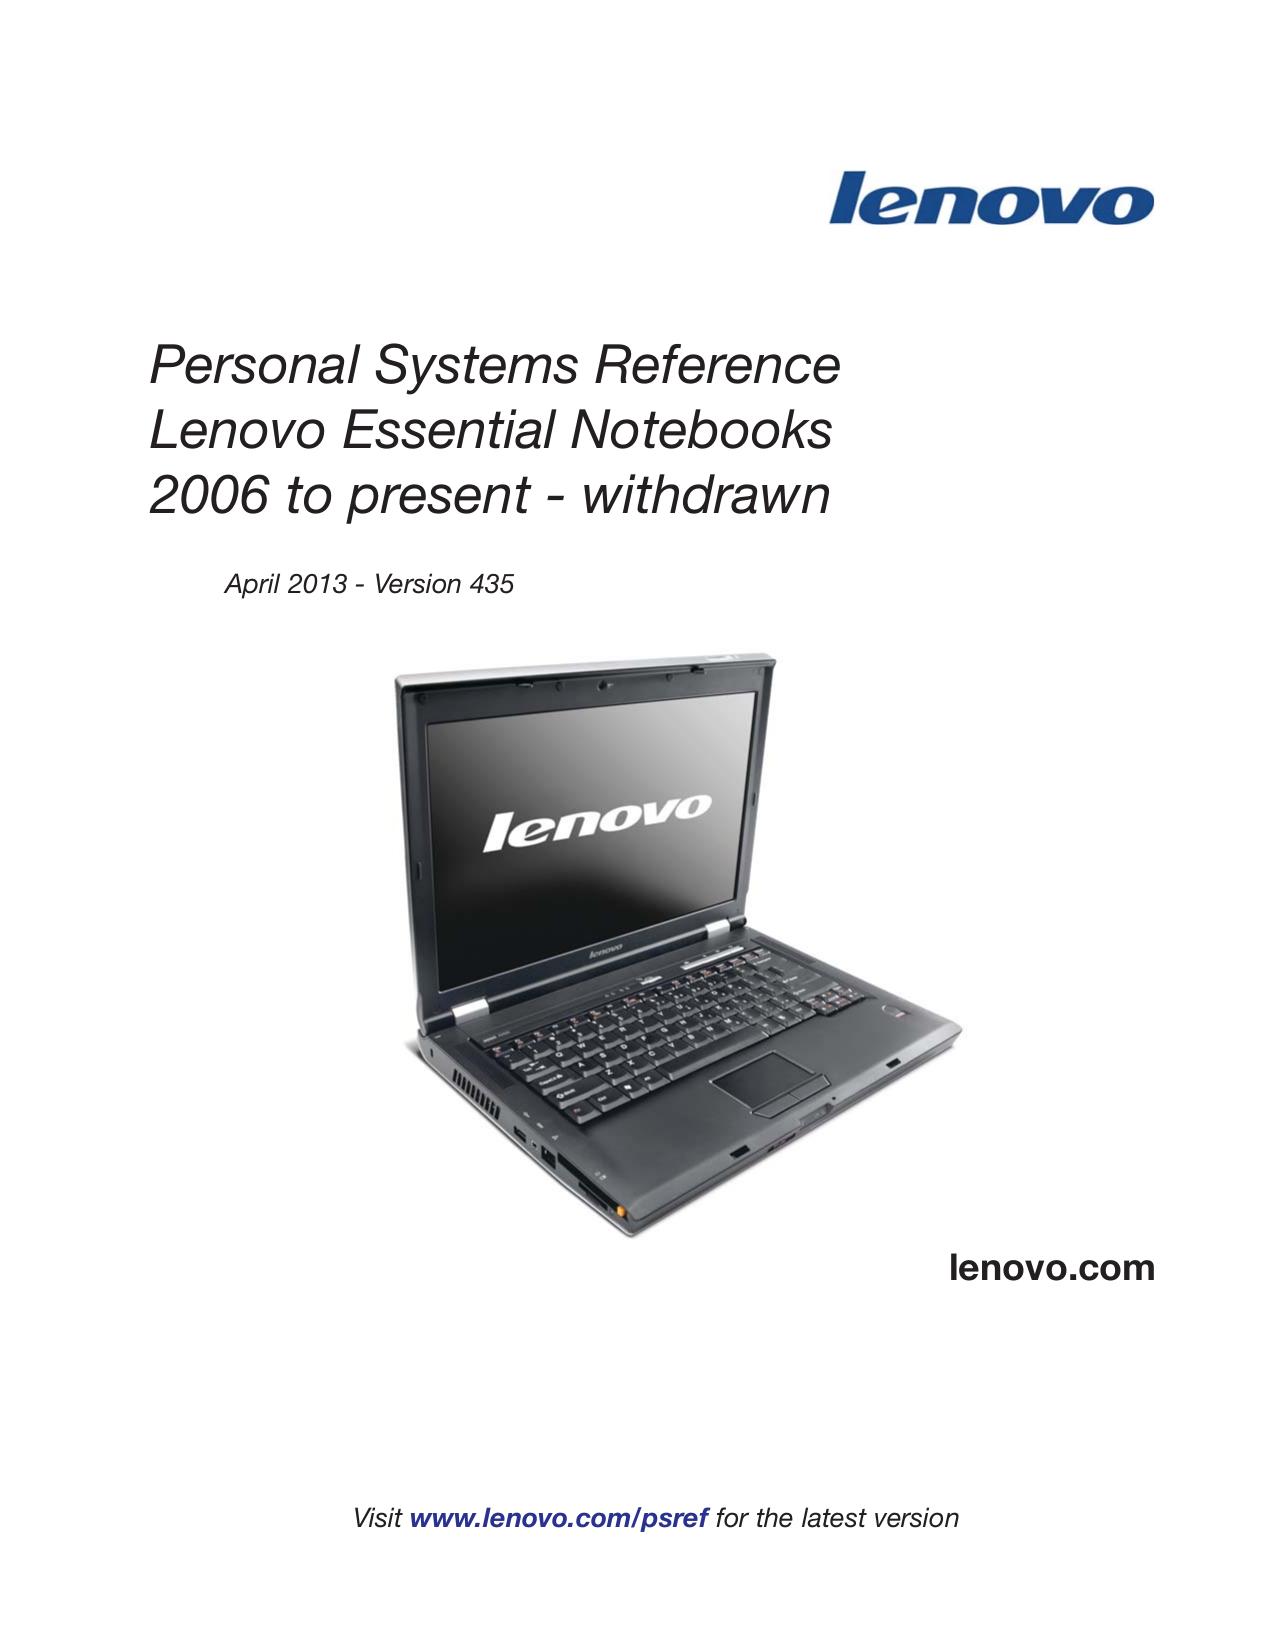 lenovo 3000 n100 manual free owners manual u2022 rh wordworksbysea com lenovo 3000 c100 service manual lenovo 3000 n200 service manual